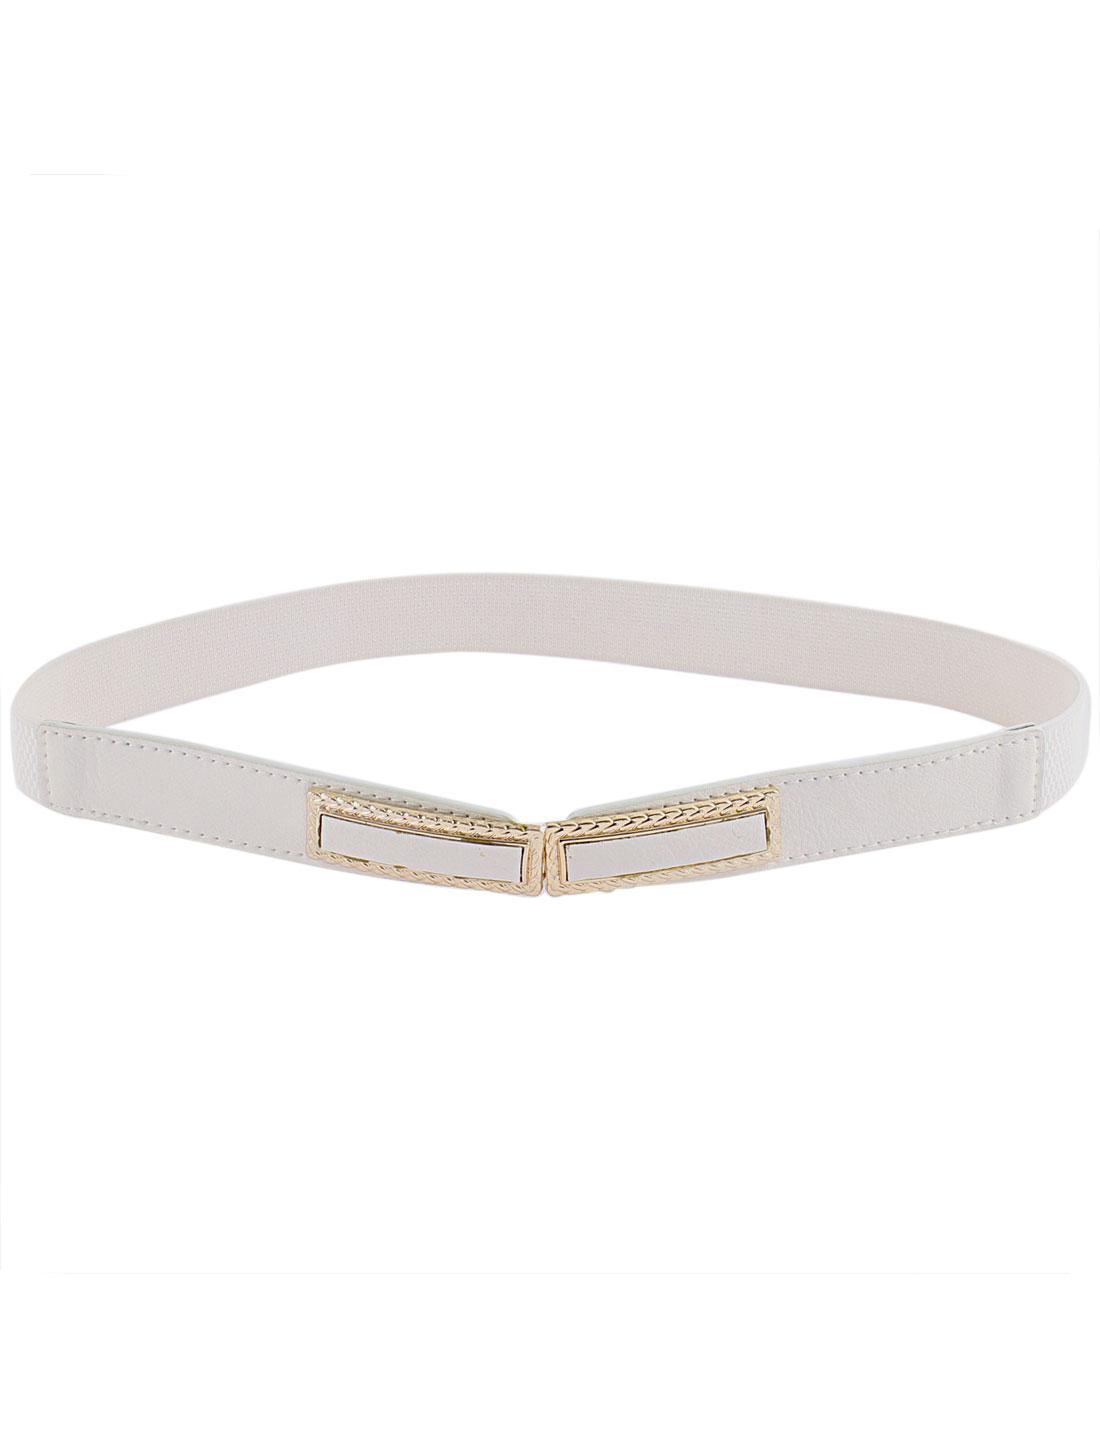 Woman Rectangle Metal Interlock Buckle Elastic Thin Waist Belt Cinch White